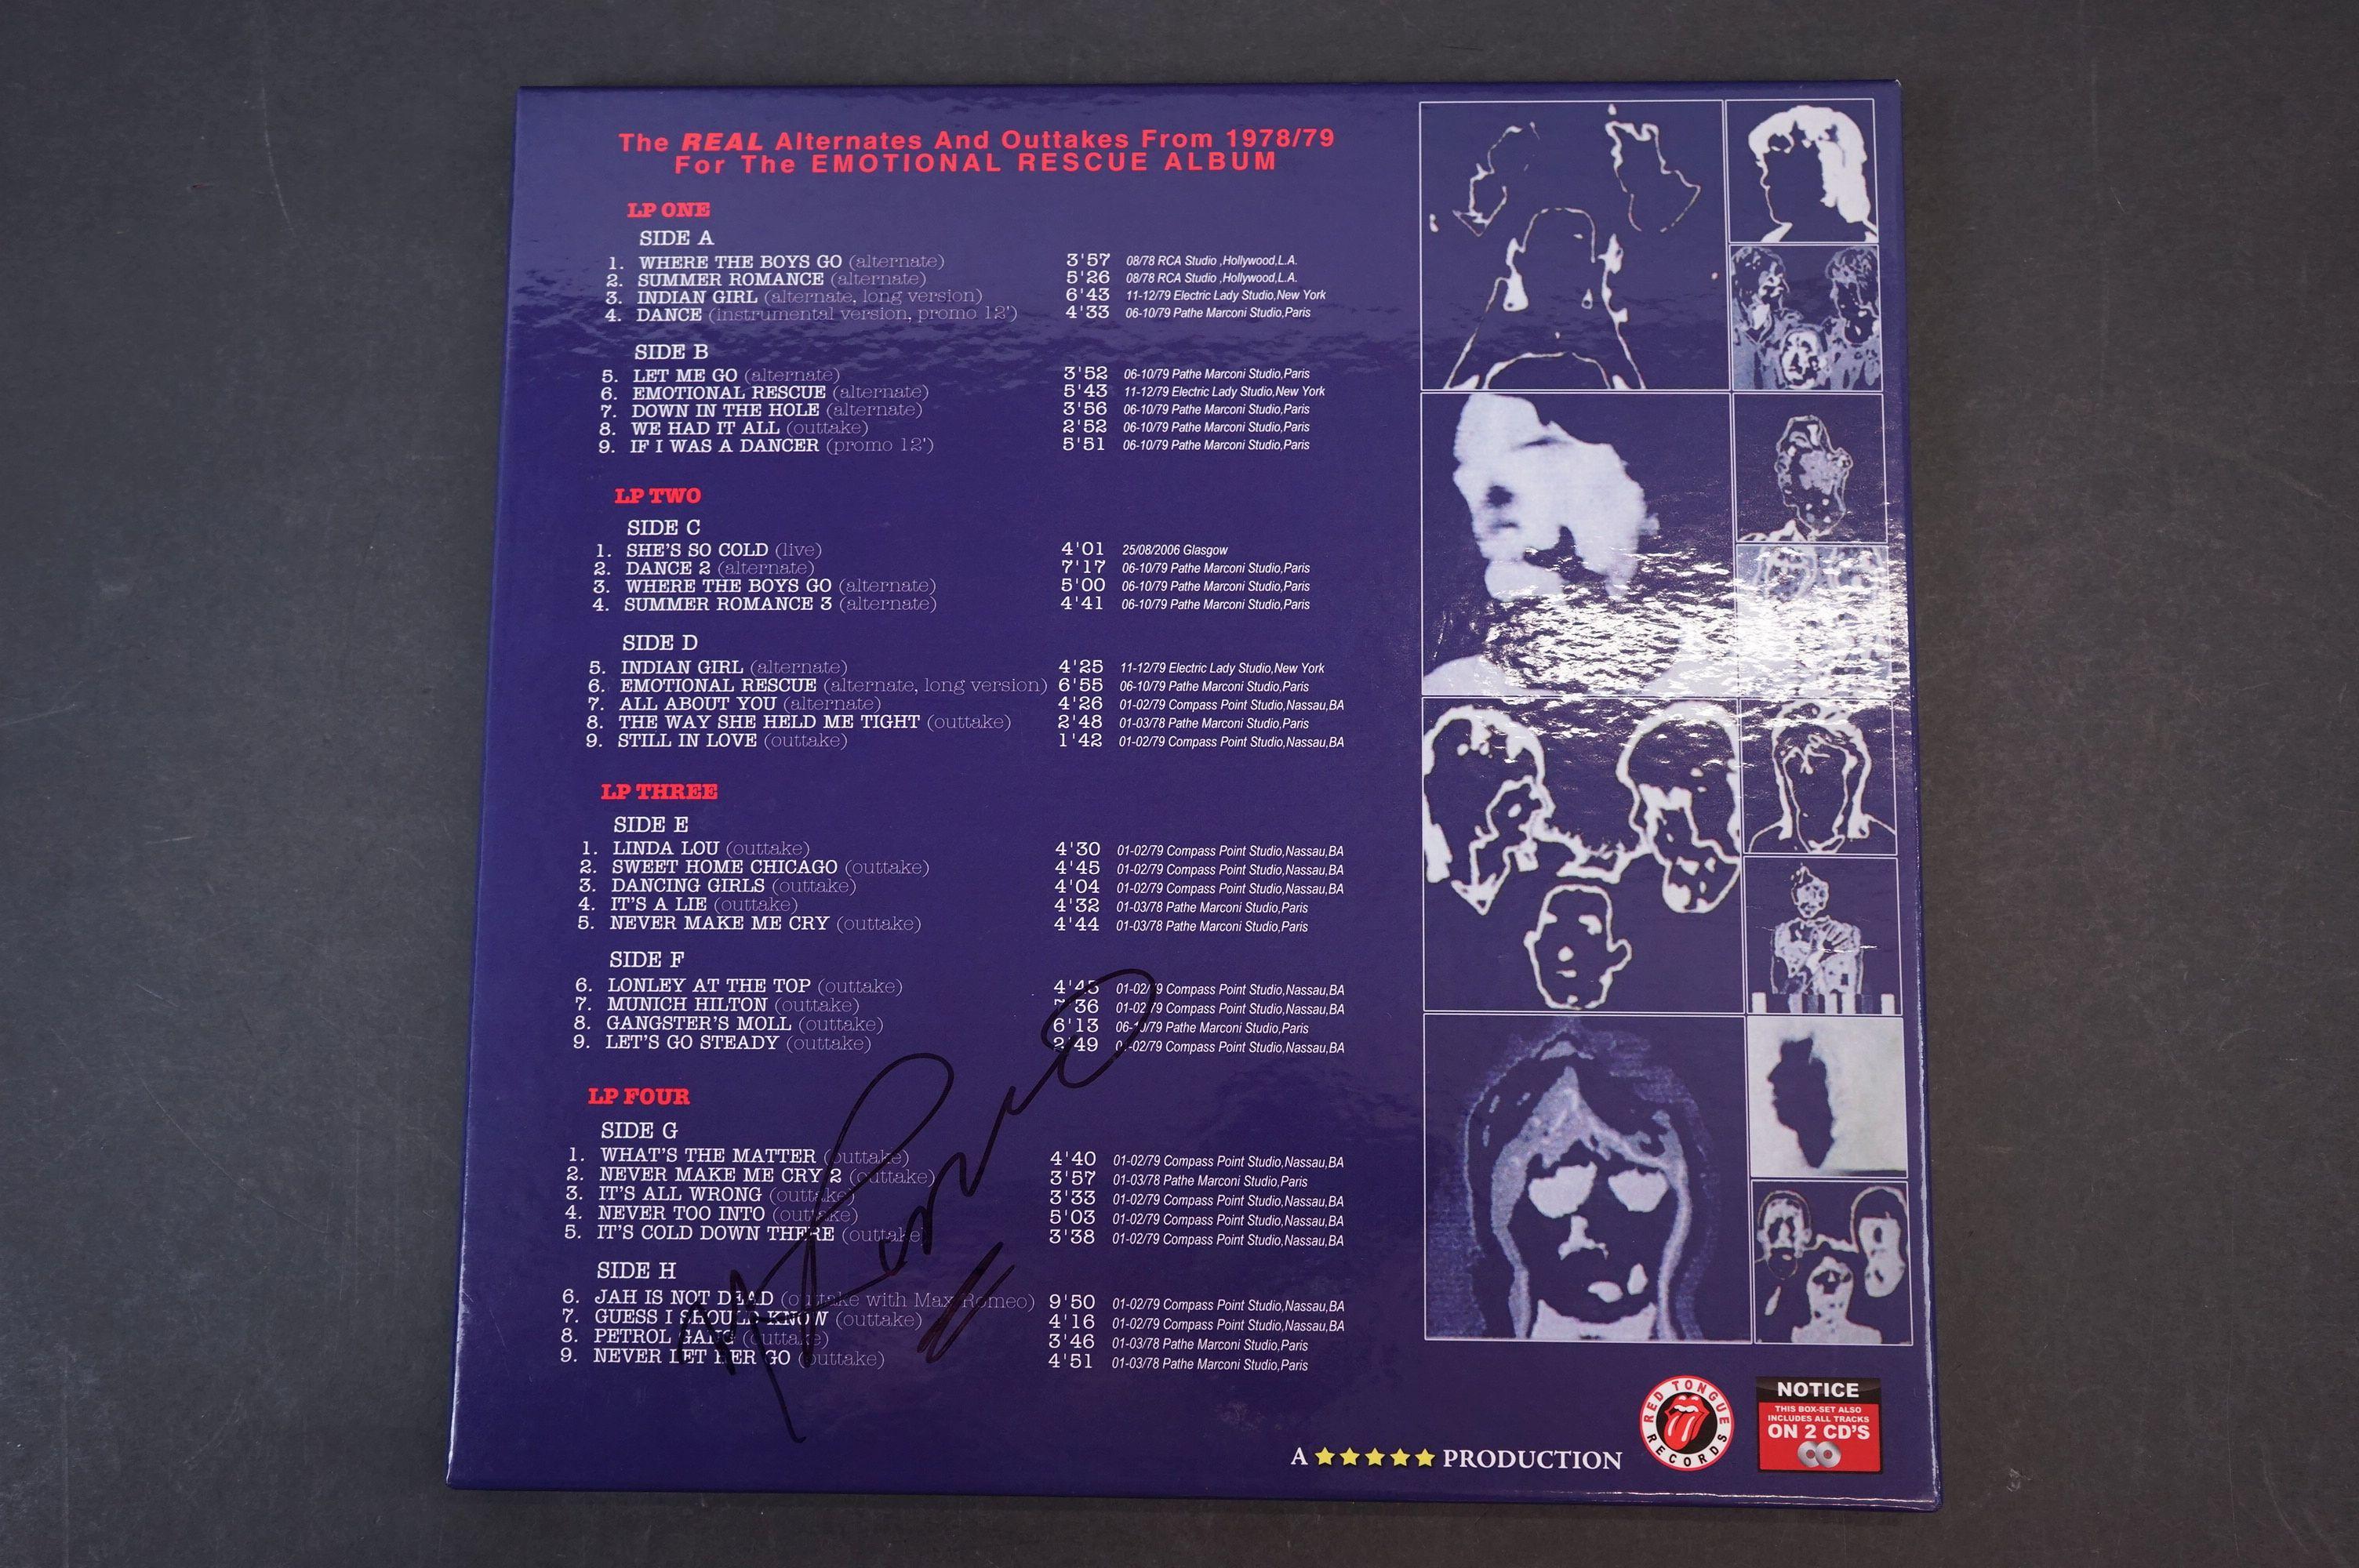 Vinyl - ltd edn The Real Alternate Album Rolling Stones Emotional Rescue 4 LP / 2 CD Box Set, - Image 10 of 12